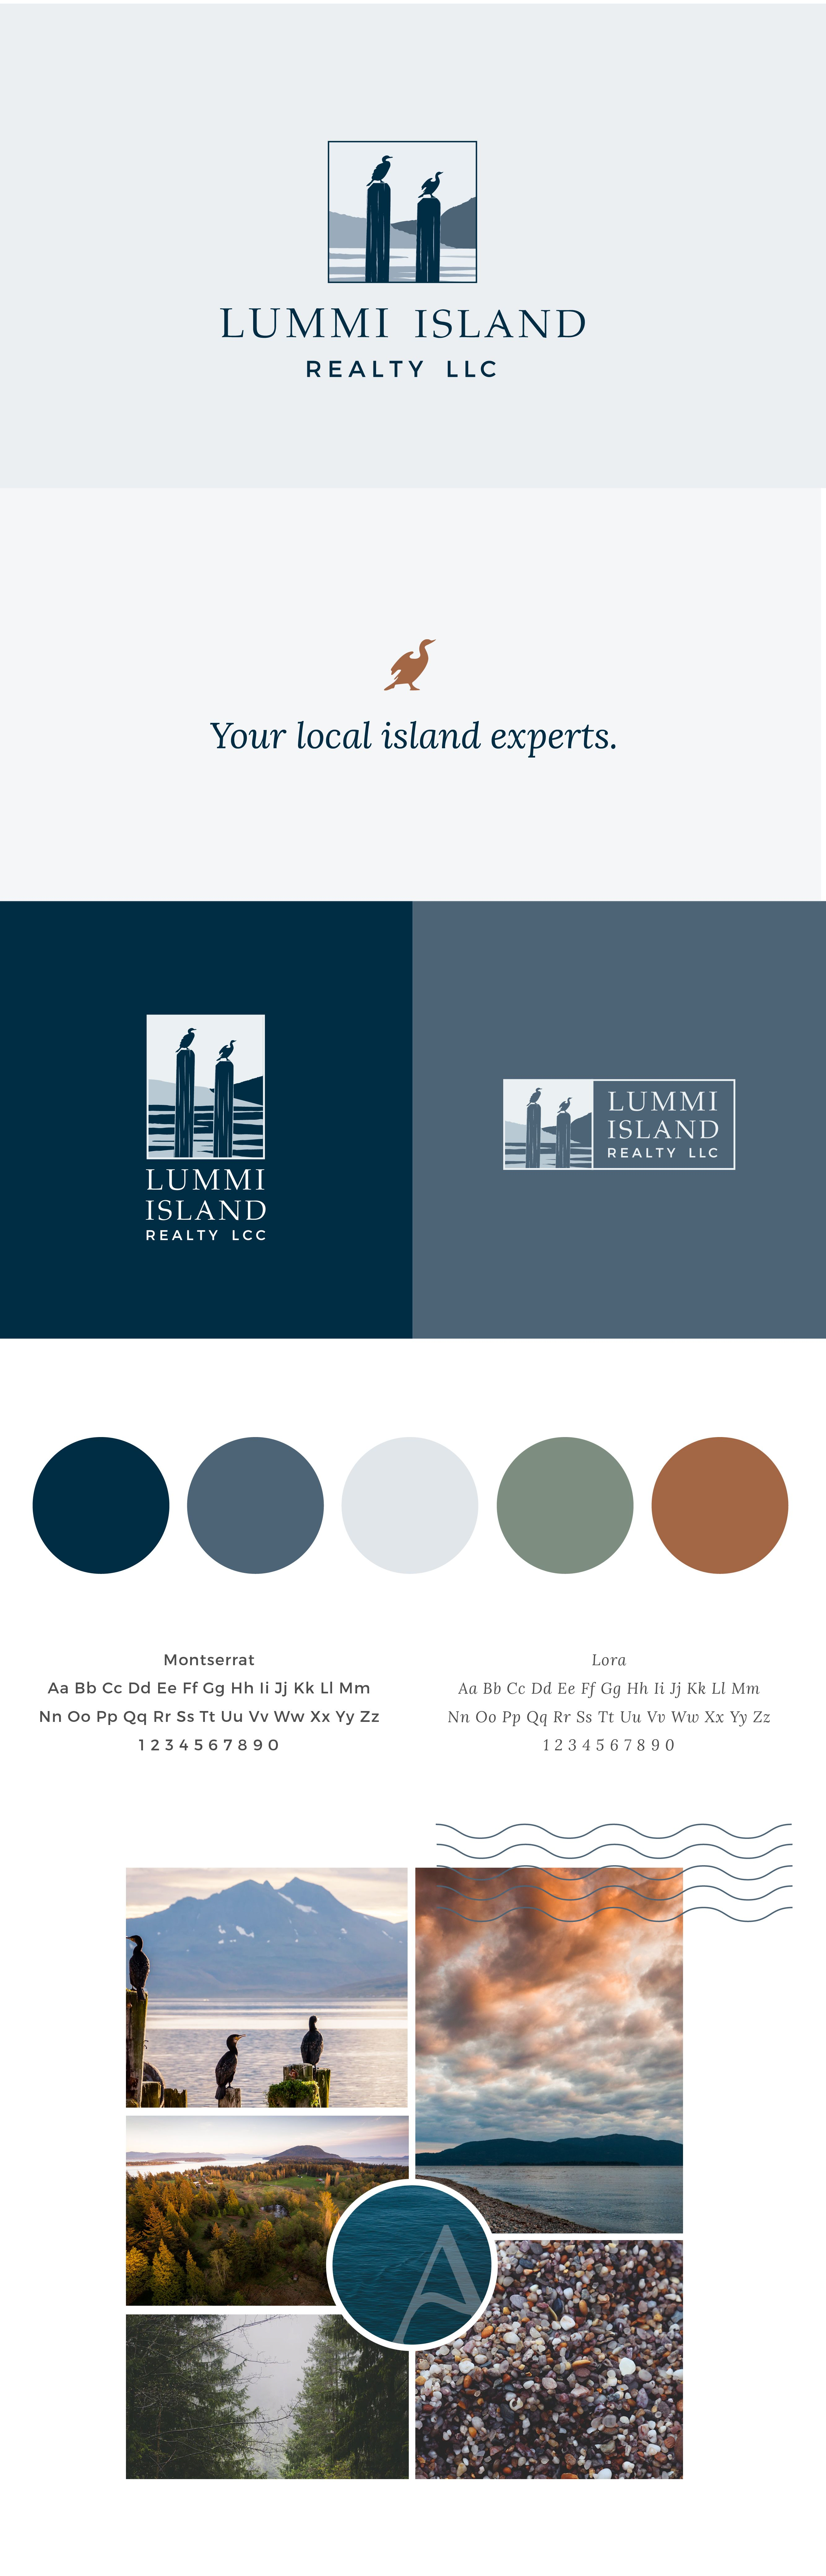 Full Rebrand Of Lummi Island Realty In Washington State Pacific Northwest Design Inspired By C Fashion Logo Design Inspiration Fashion Logo Design Logo Design